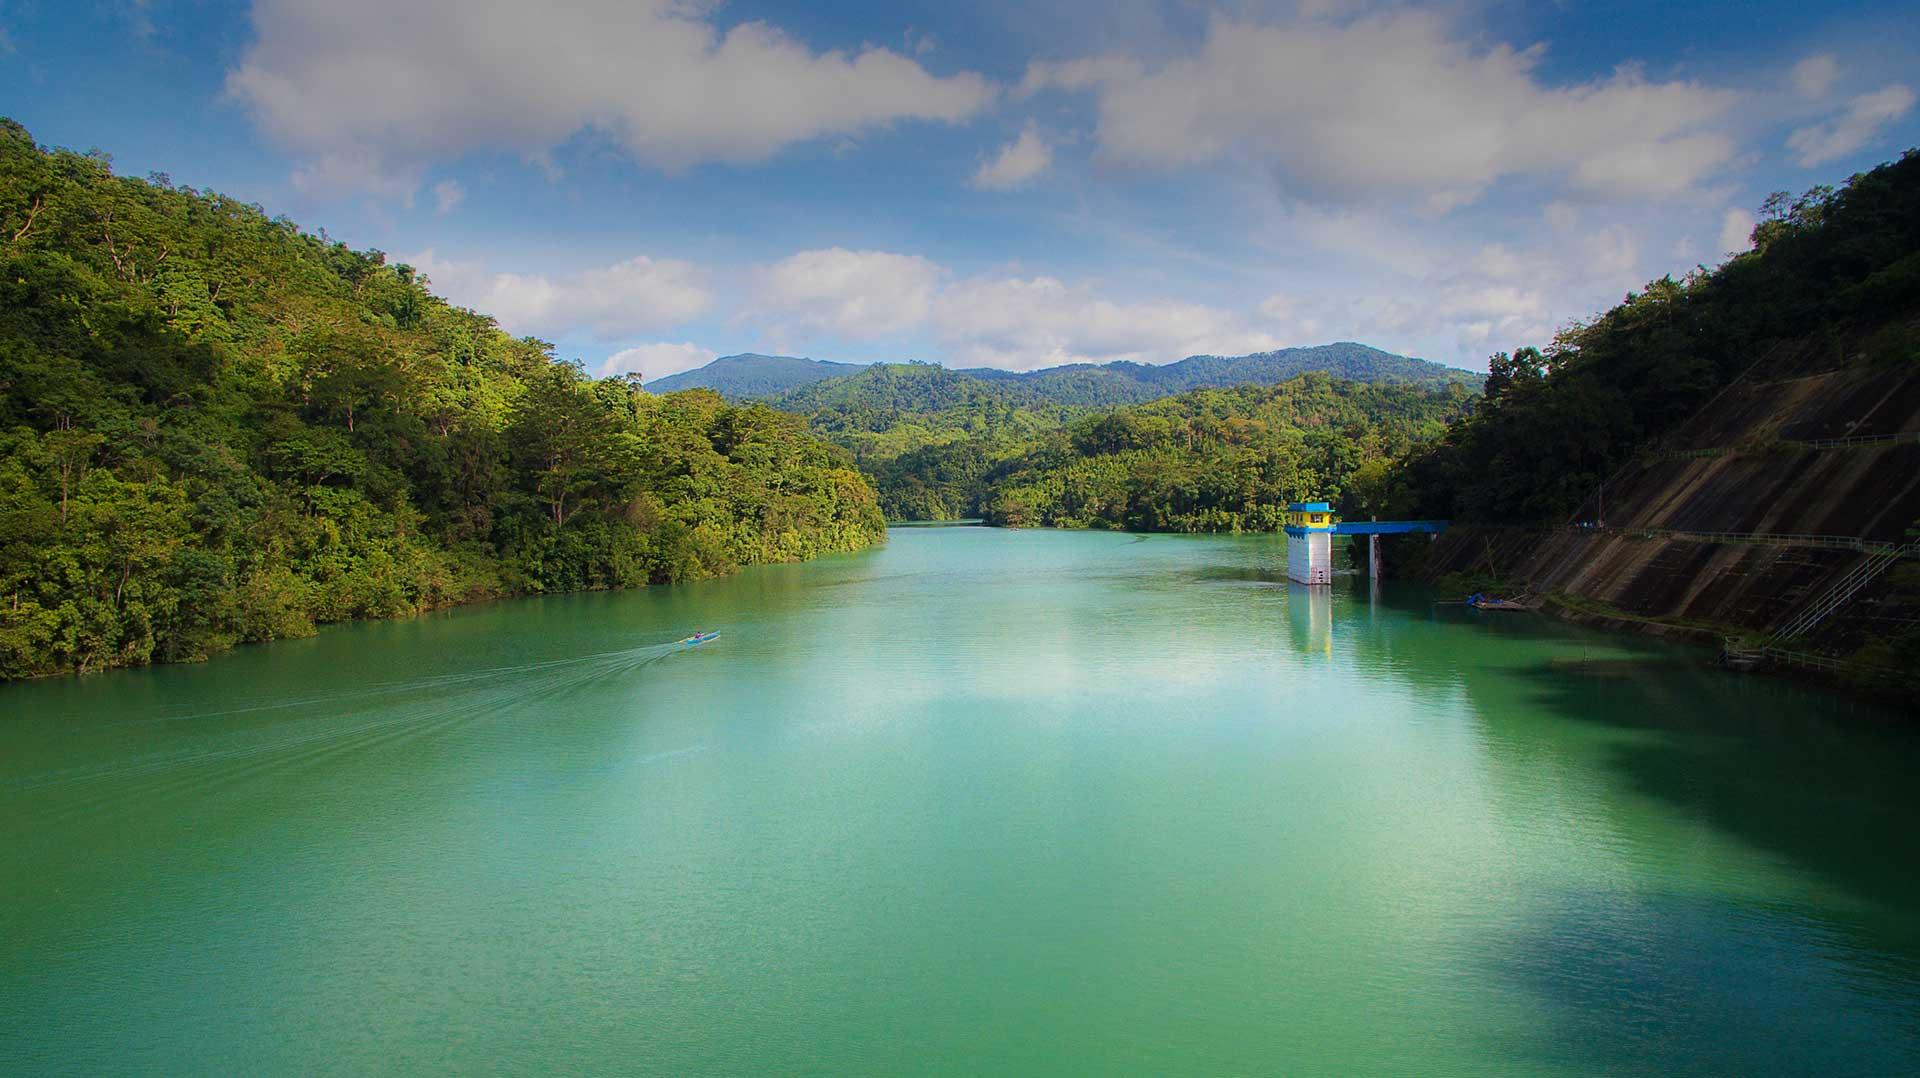 City of santa rosa water quality report for atascadero